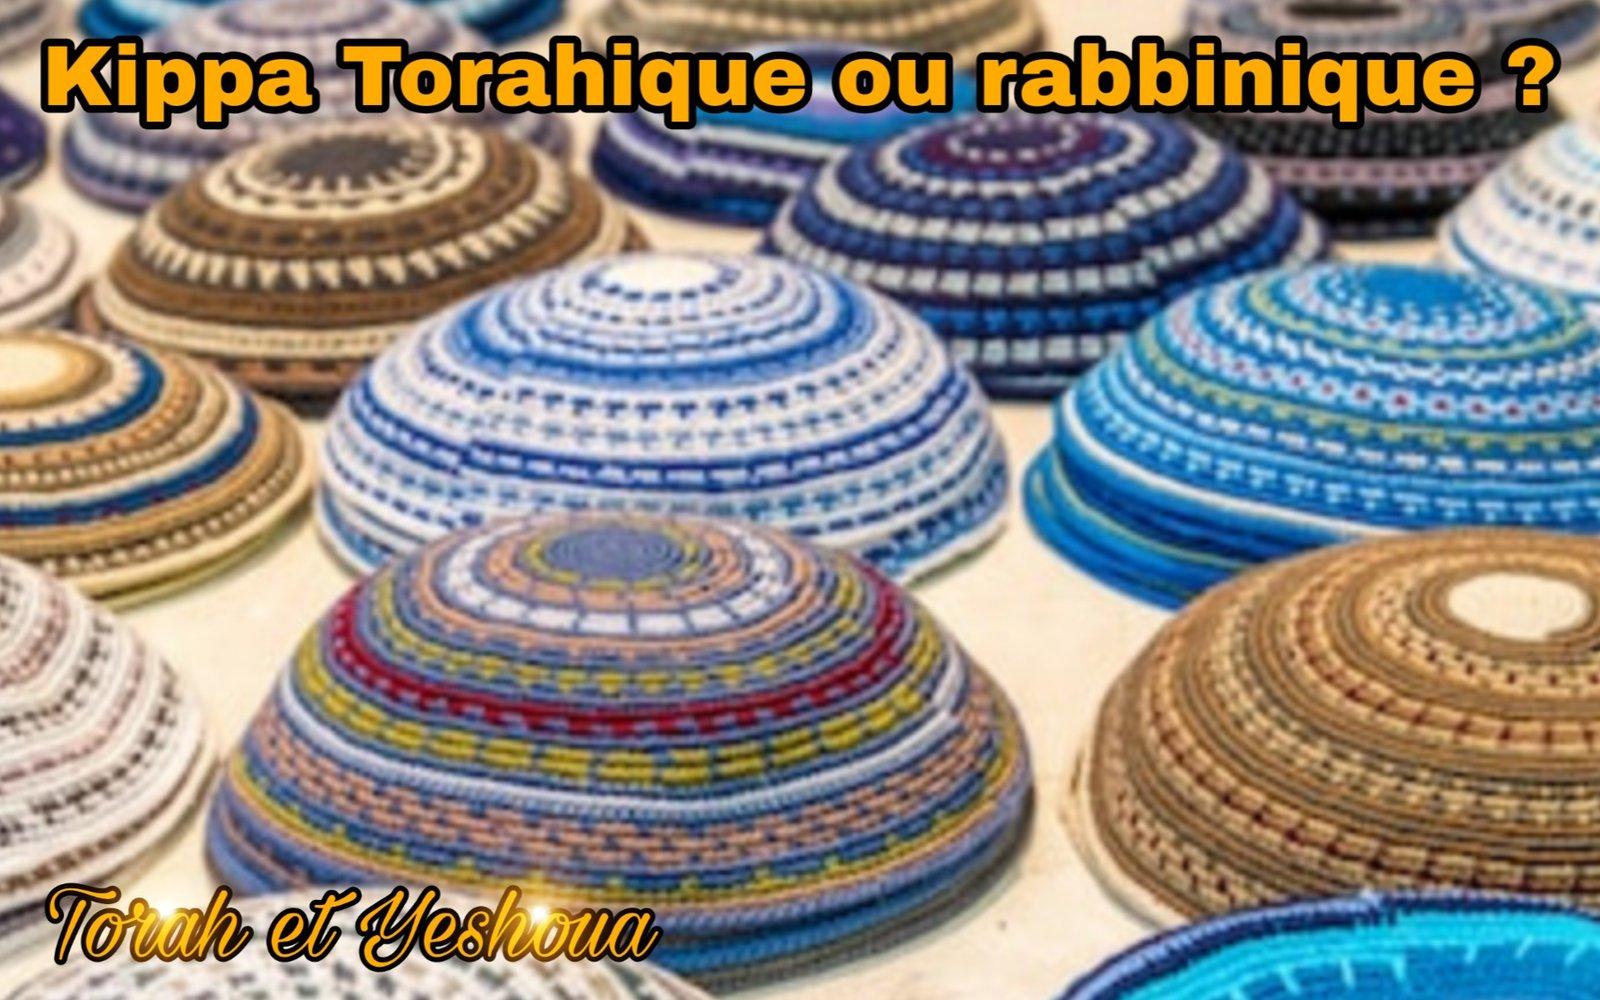 Kippa Torahique ou rabbinique ? 200727100925317317